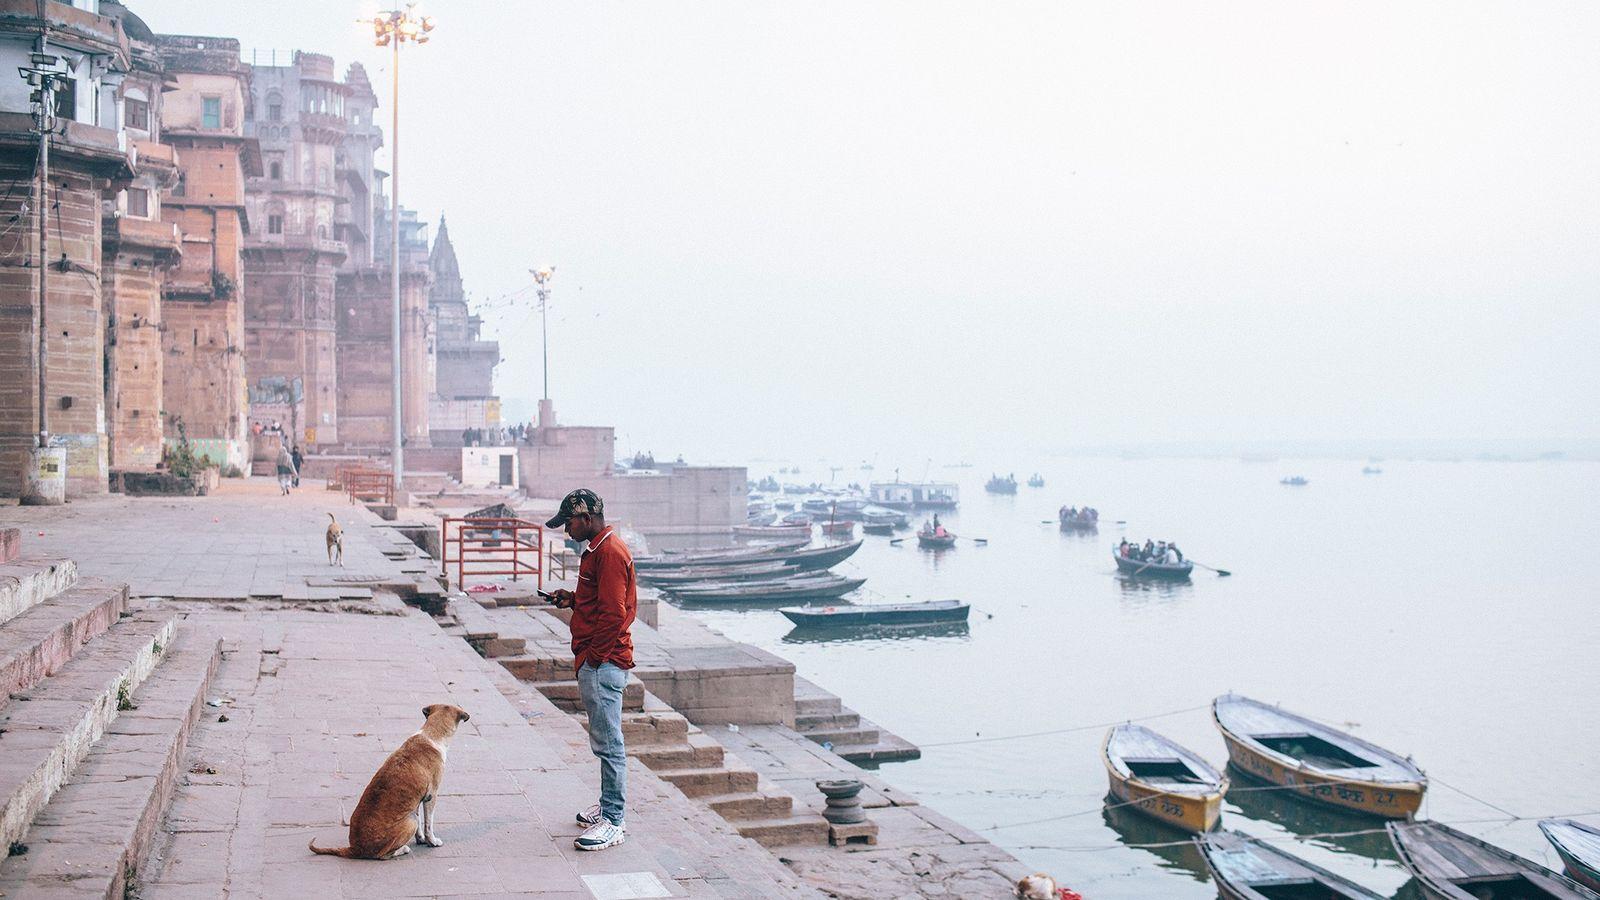 A stray dog sits by a man in Varanasi, a city in Uttar Pradesh. A recent ...